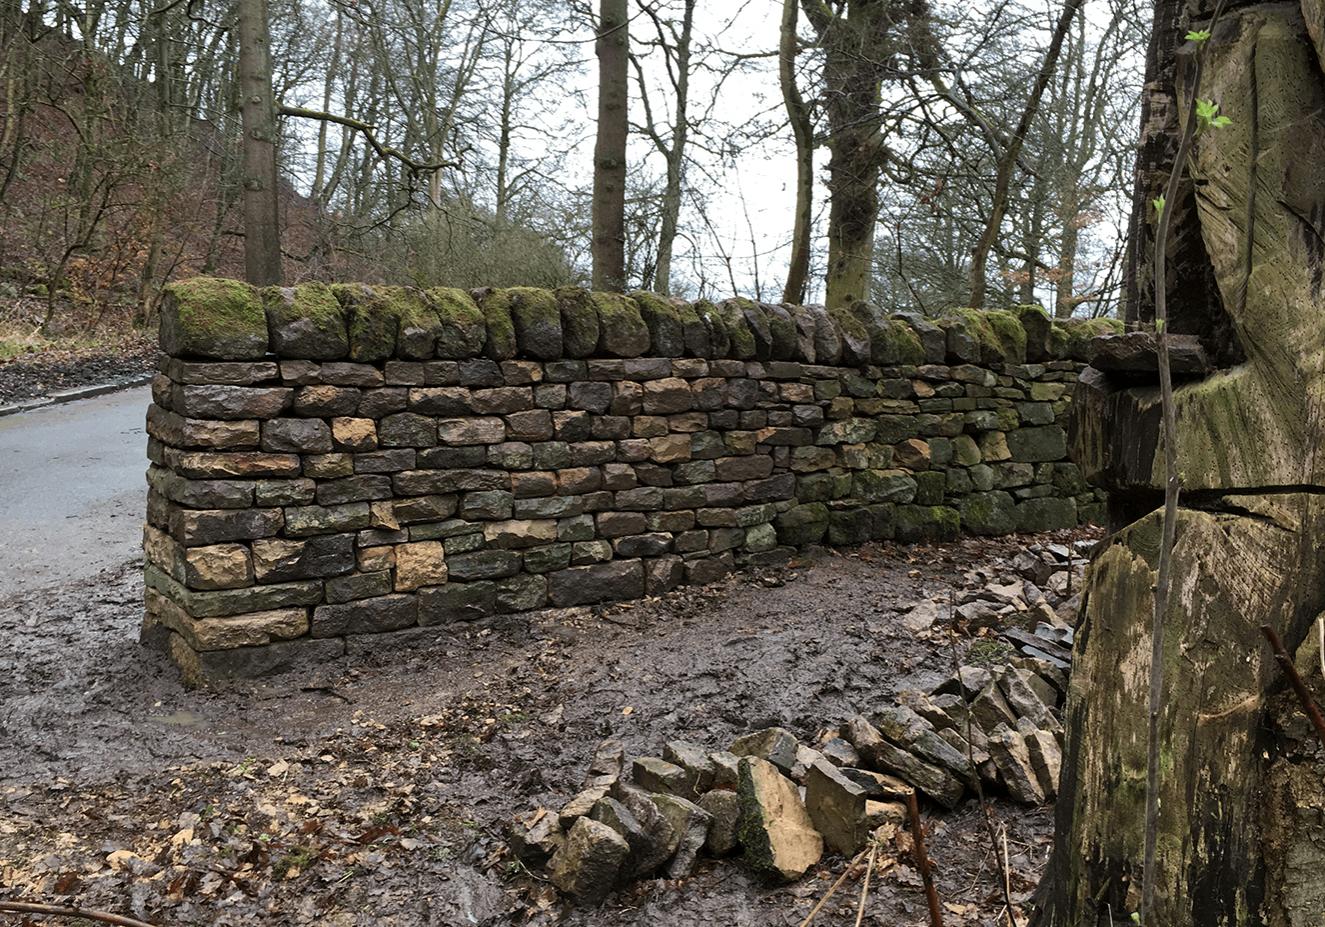 Dry stone walling in Otley